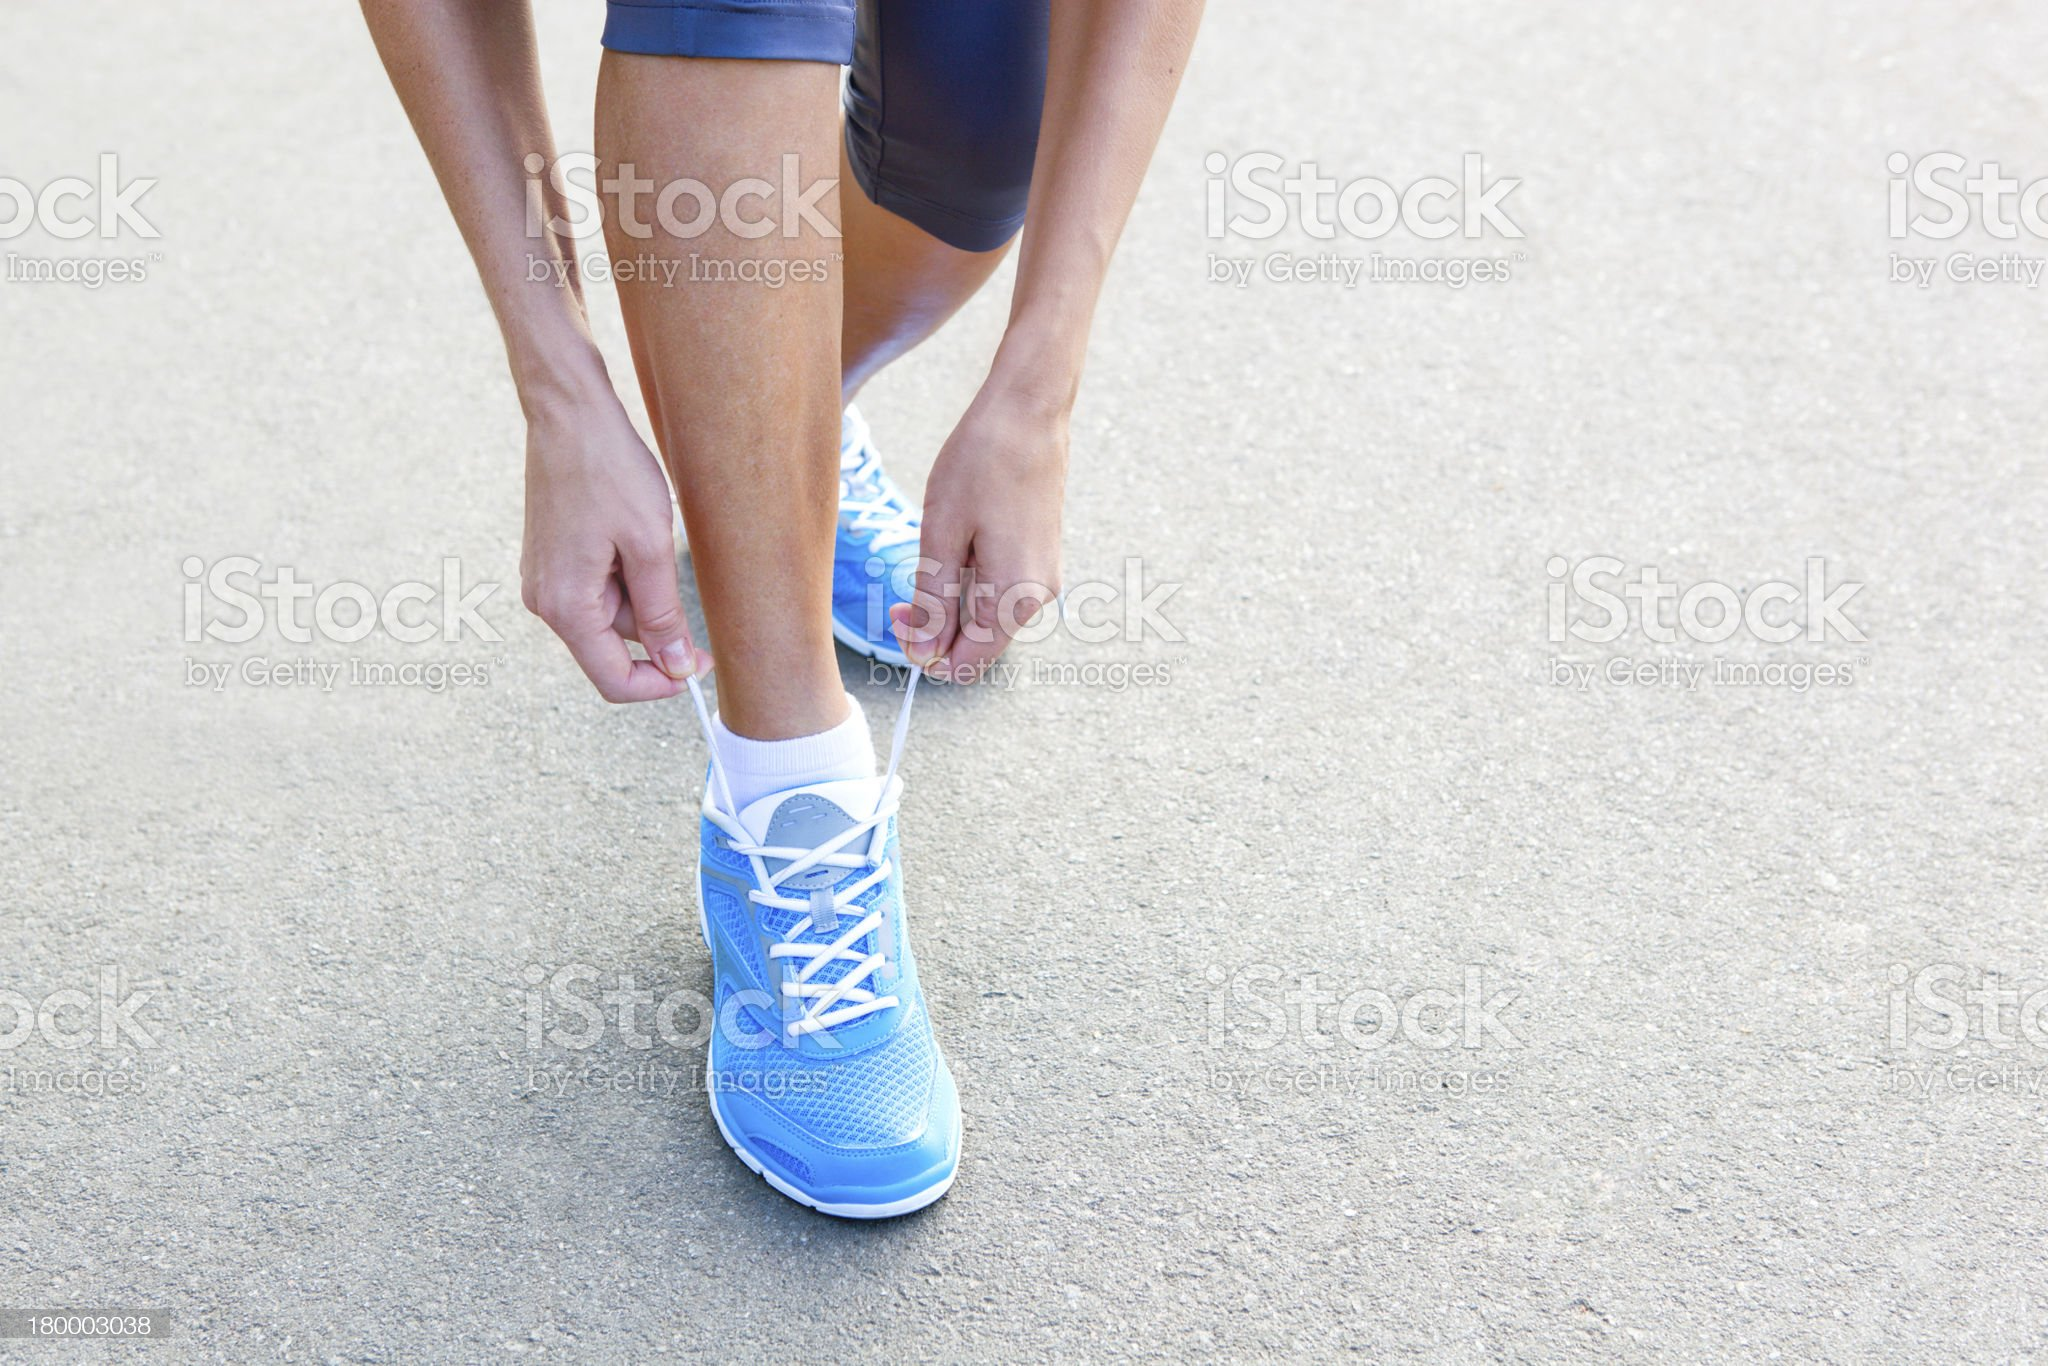 Closeup of Young Woman Tying Sports Shoe. royalty-free stock photo